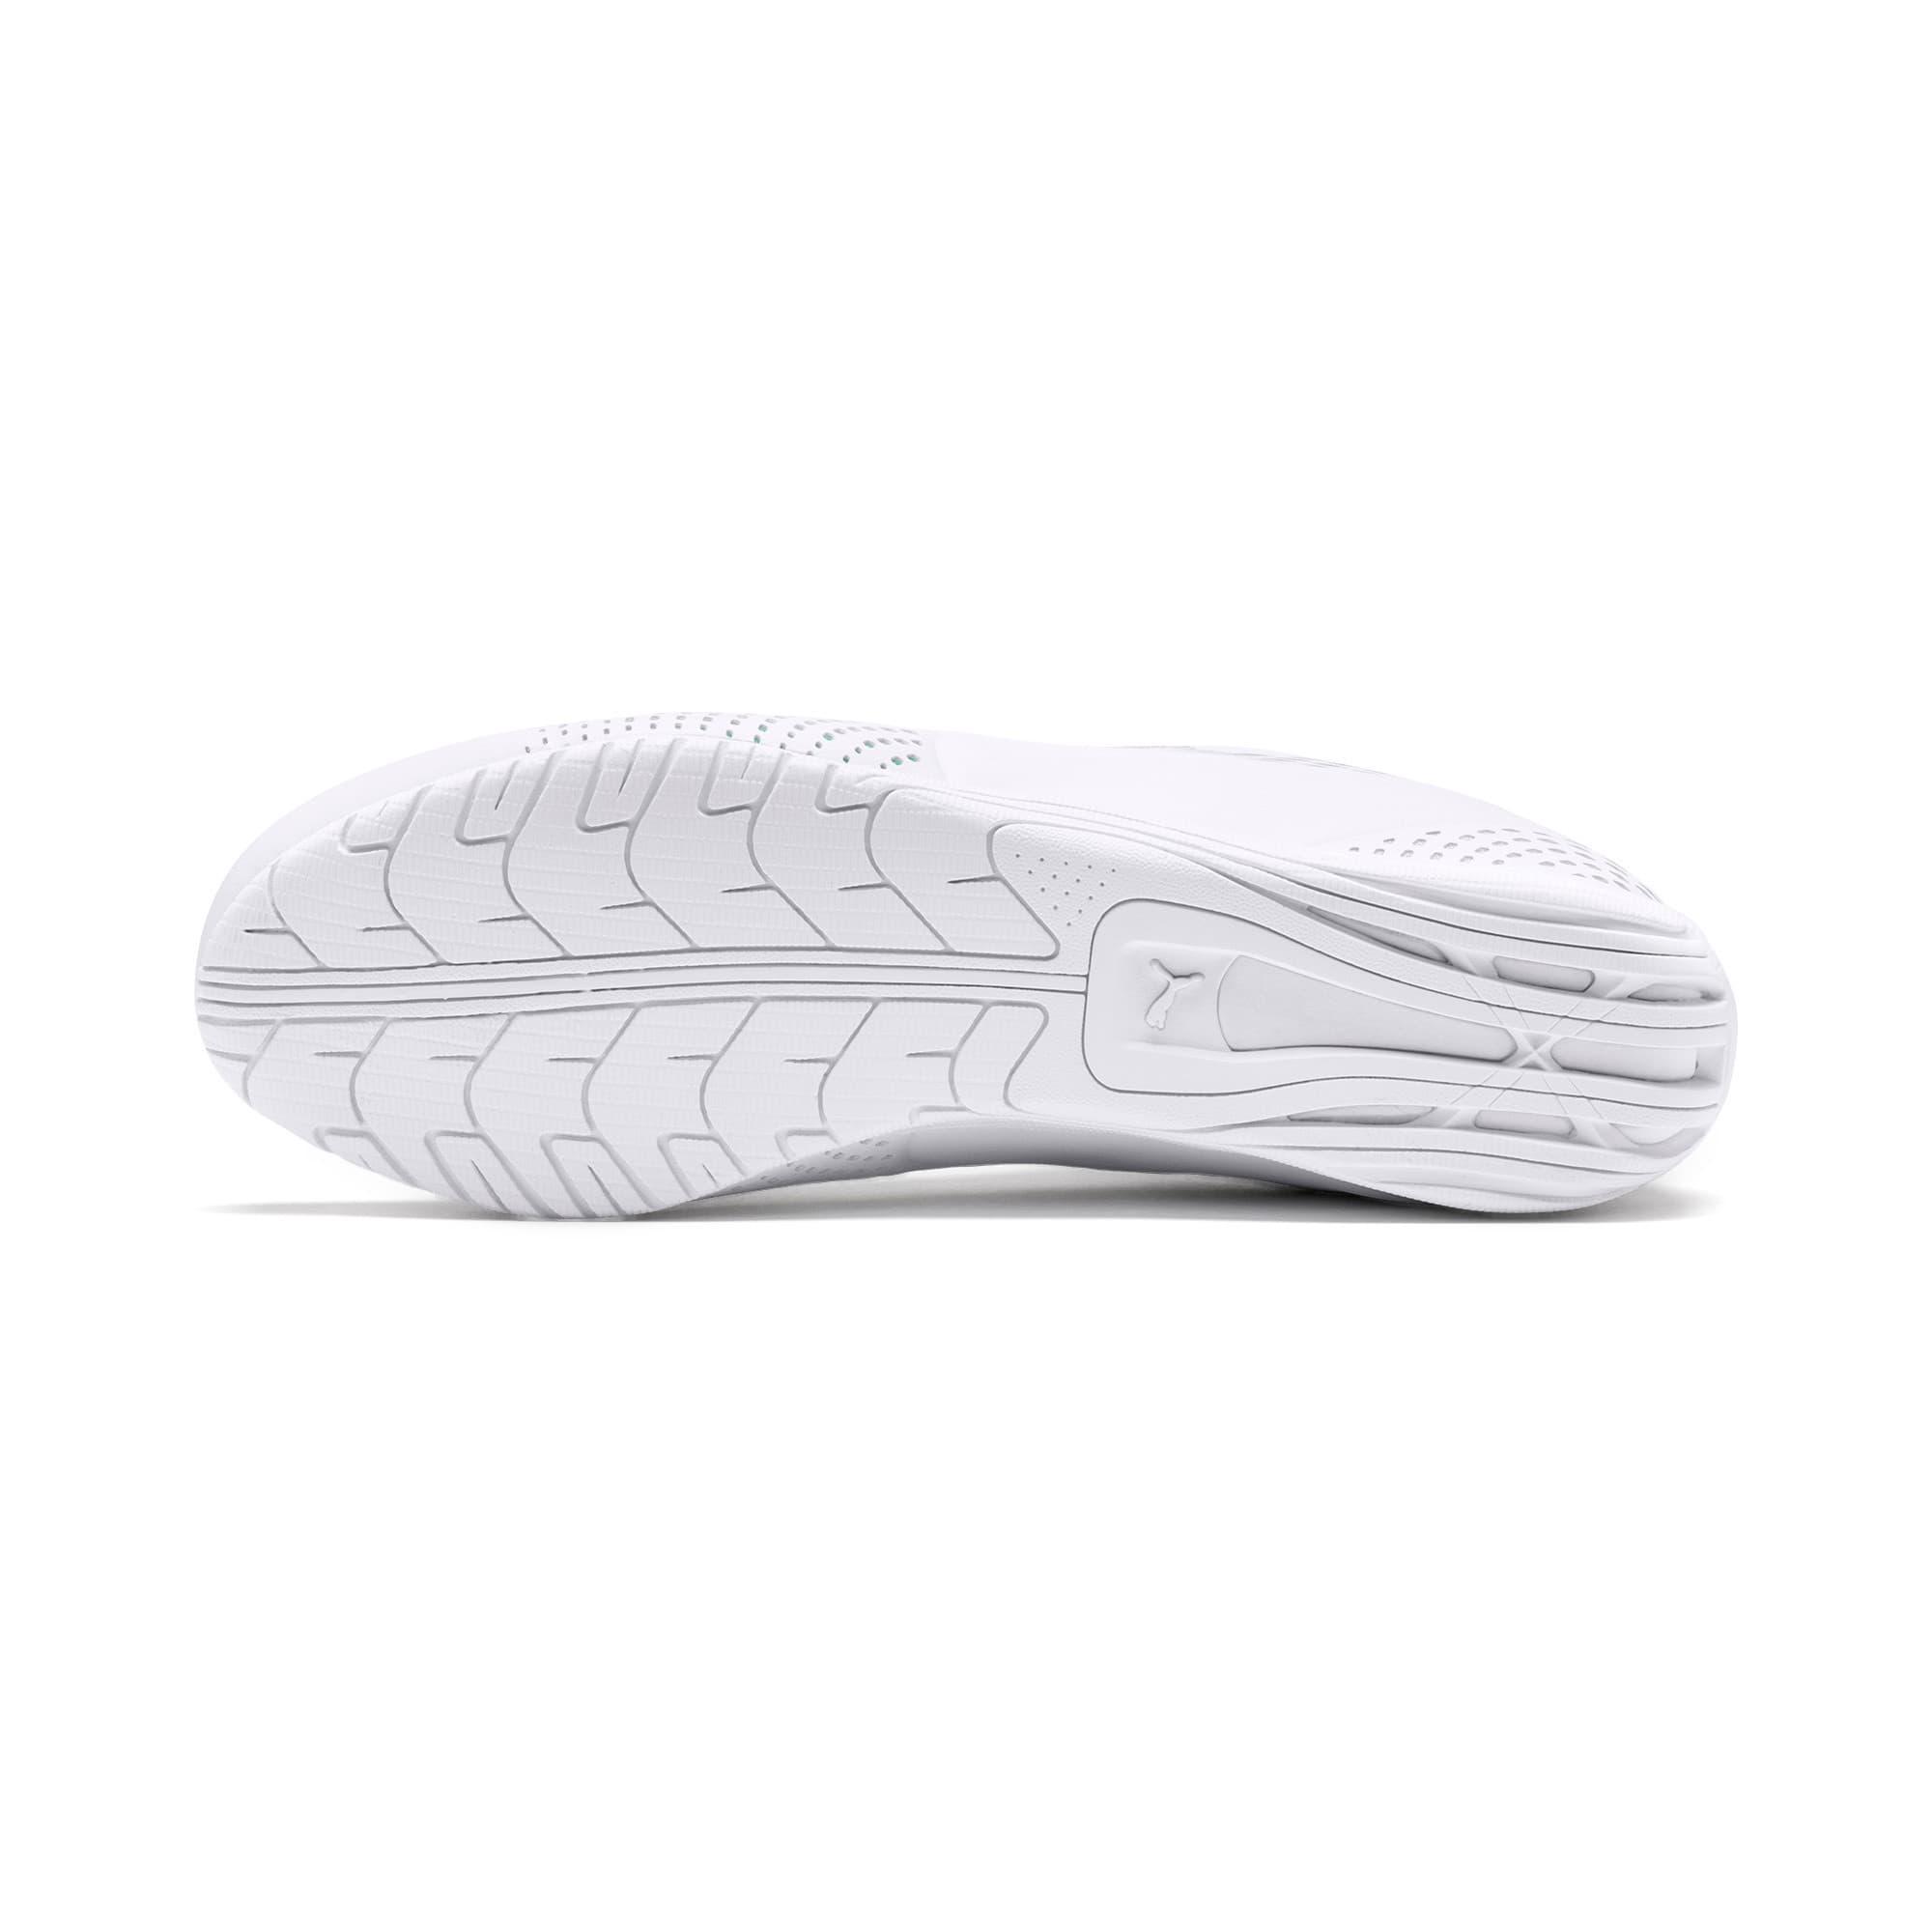 Miniatura 5 de Zapatos Mercedes AMG Petronas Drift Cat 5 Ultra II, Puma White-Spectra Green, mediano